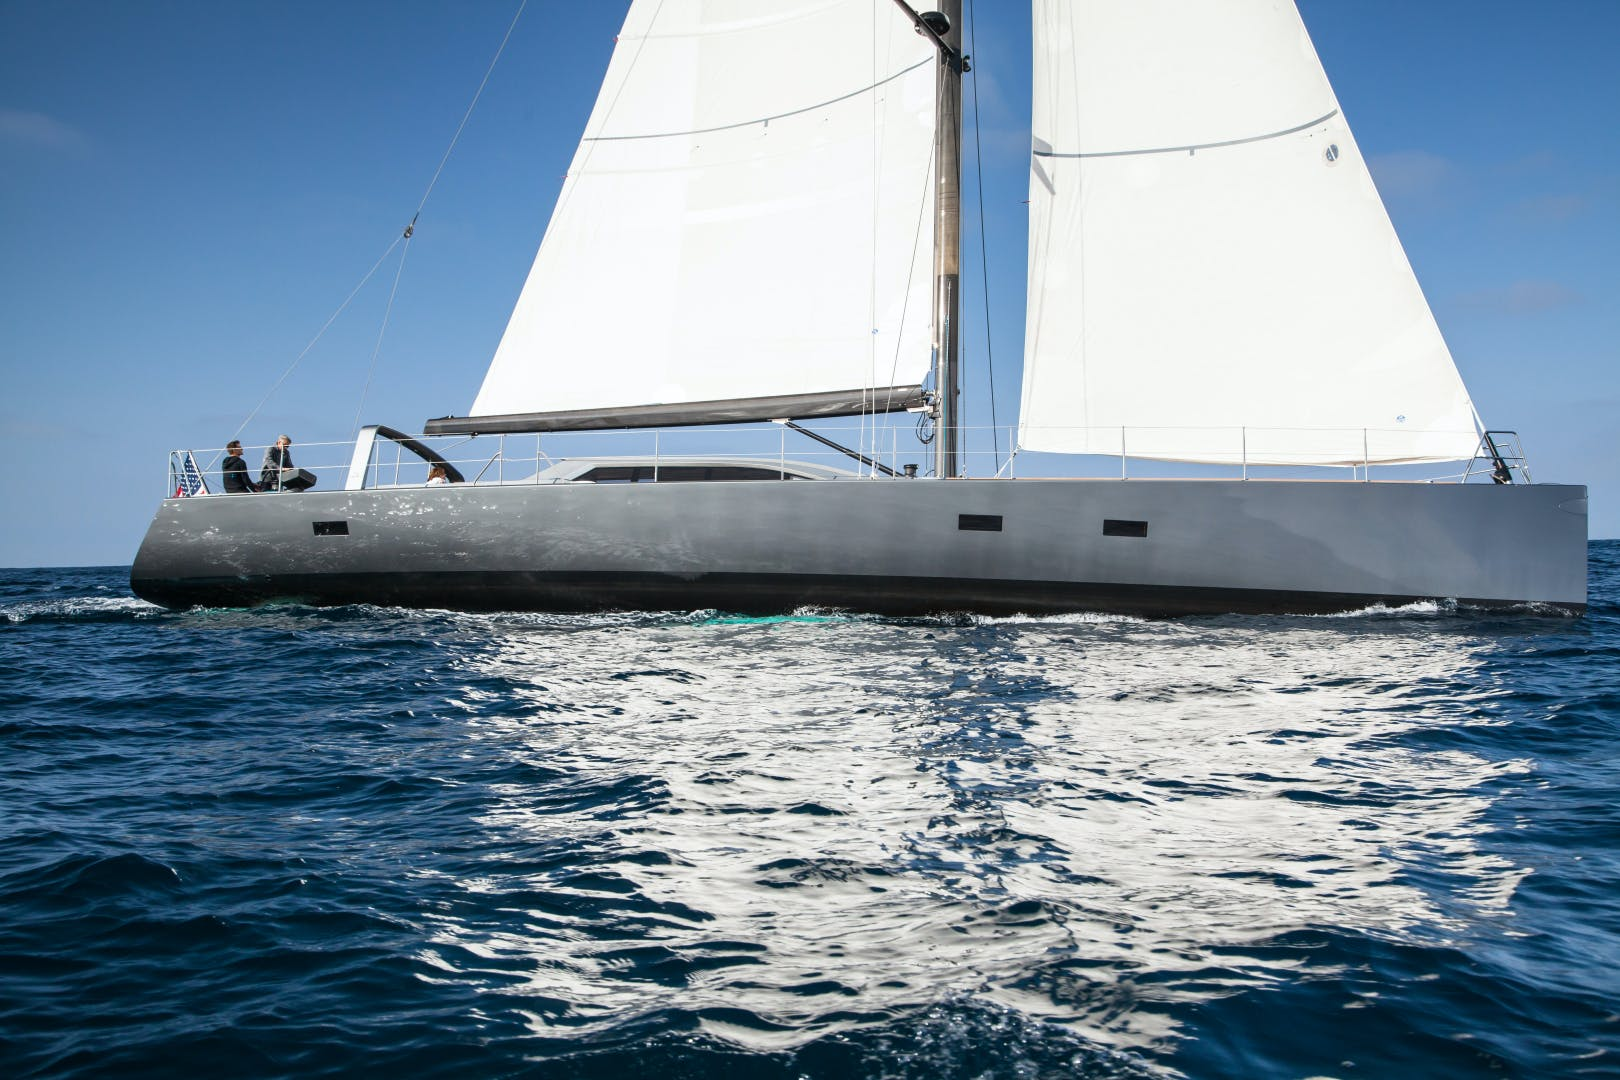 1996 Goetz / Derecktor 77' Custom Sparkman & Stephens Designed Performance Sailing Yacht AANDEEL | Picture 3 of 24